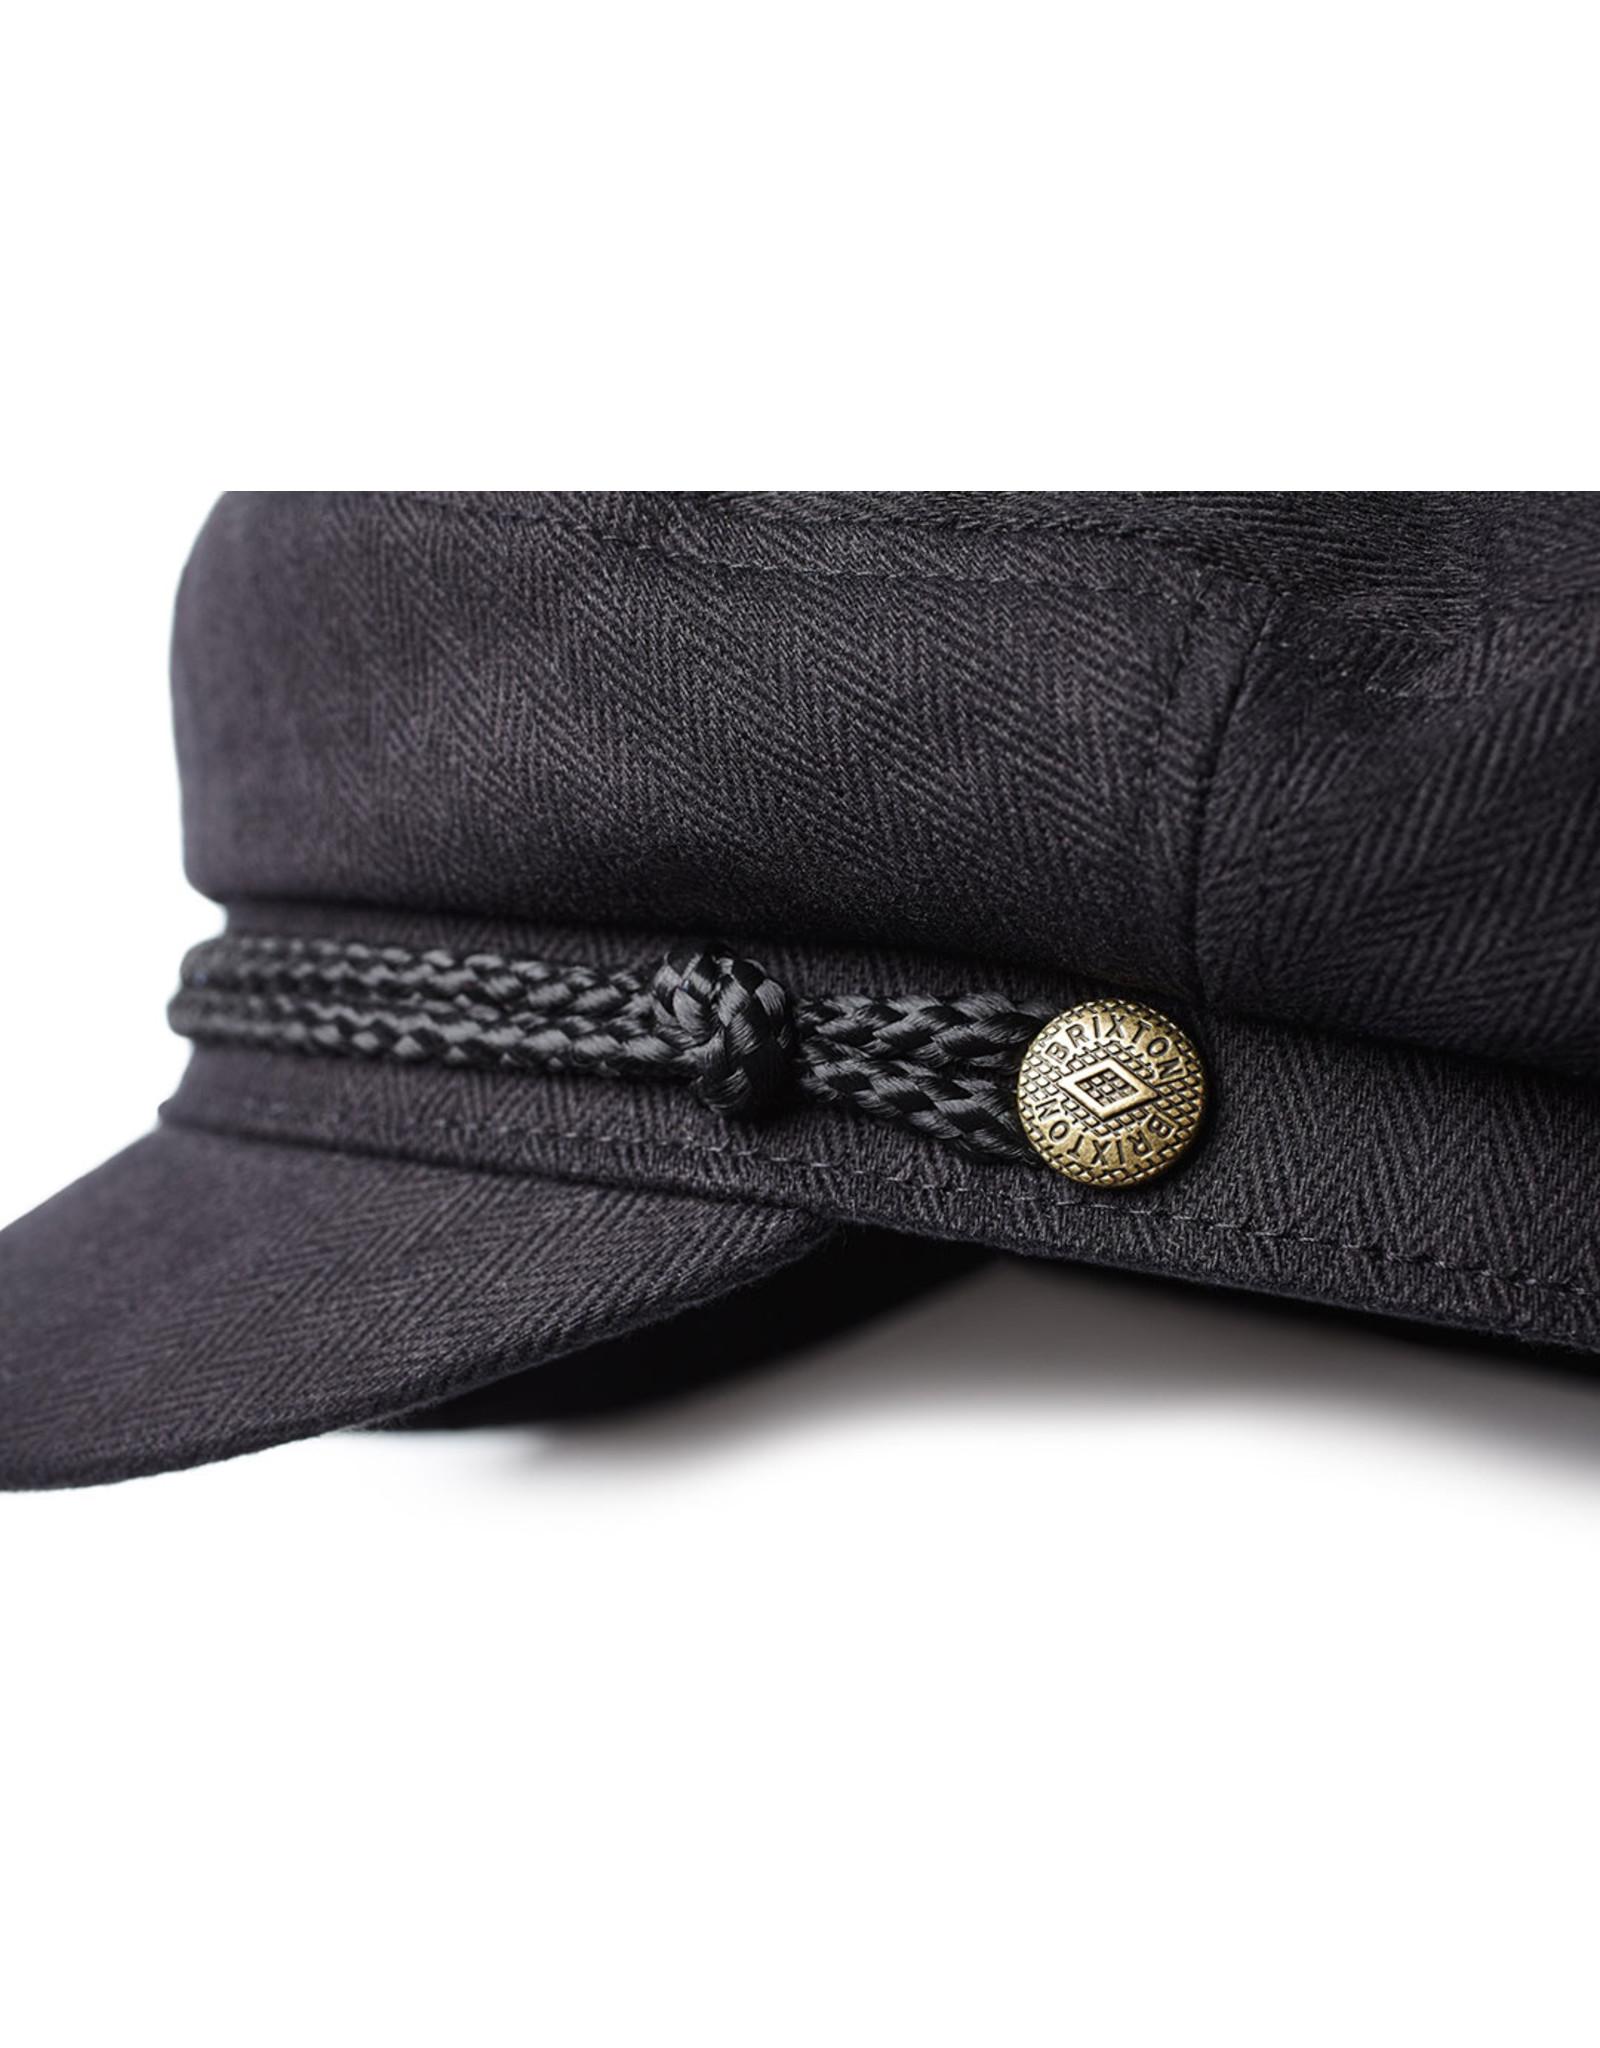 BRIXTON BRIXTON - FIDDLER CAP - BLACK -